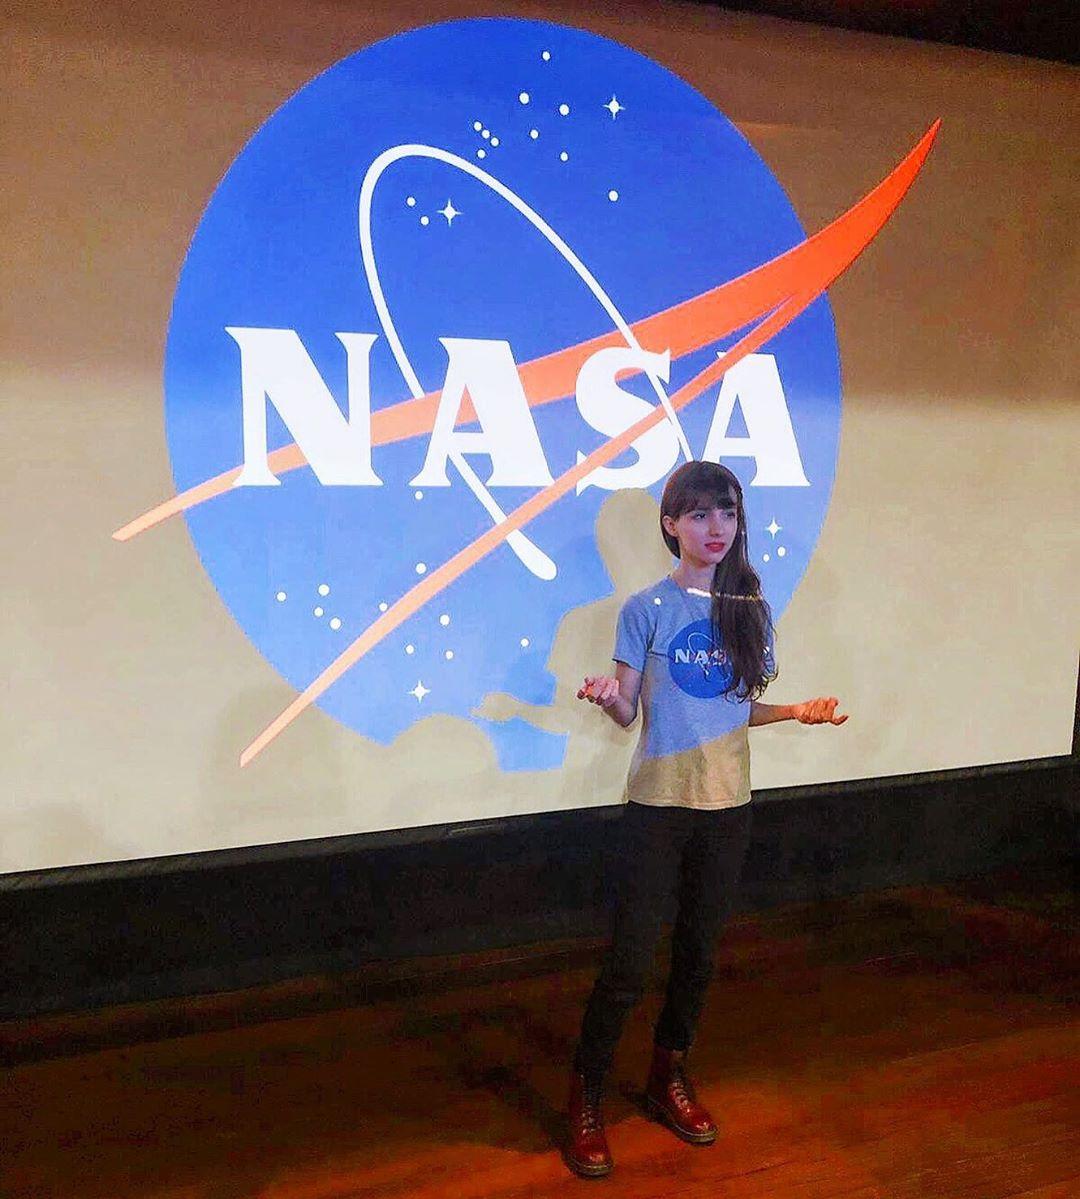 jovem astrônoma fazendo palestra